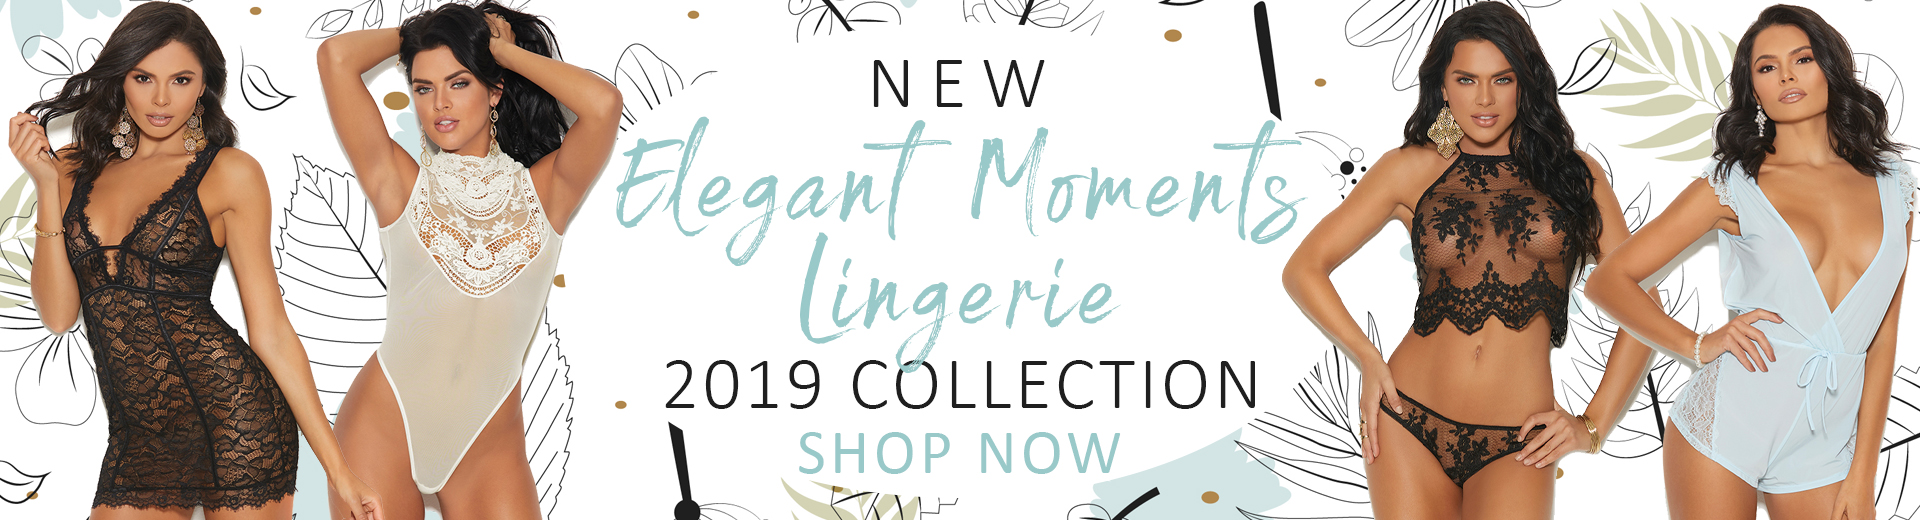 new collection elegant moments lingerie 2019 MyStripperCloset.com